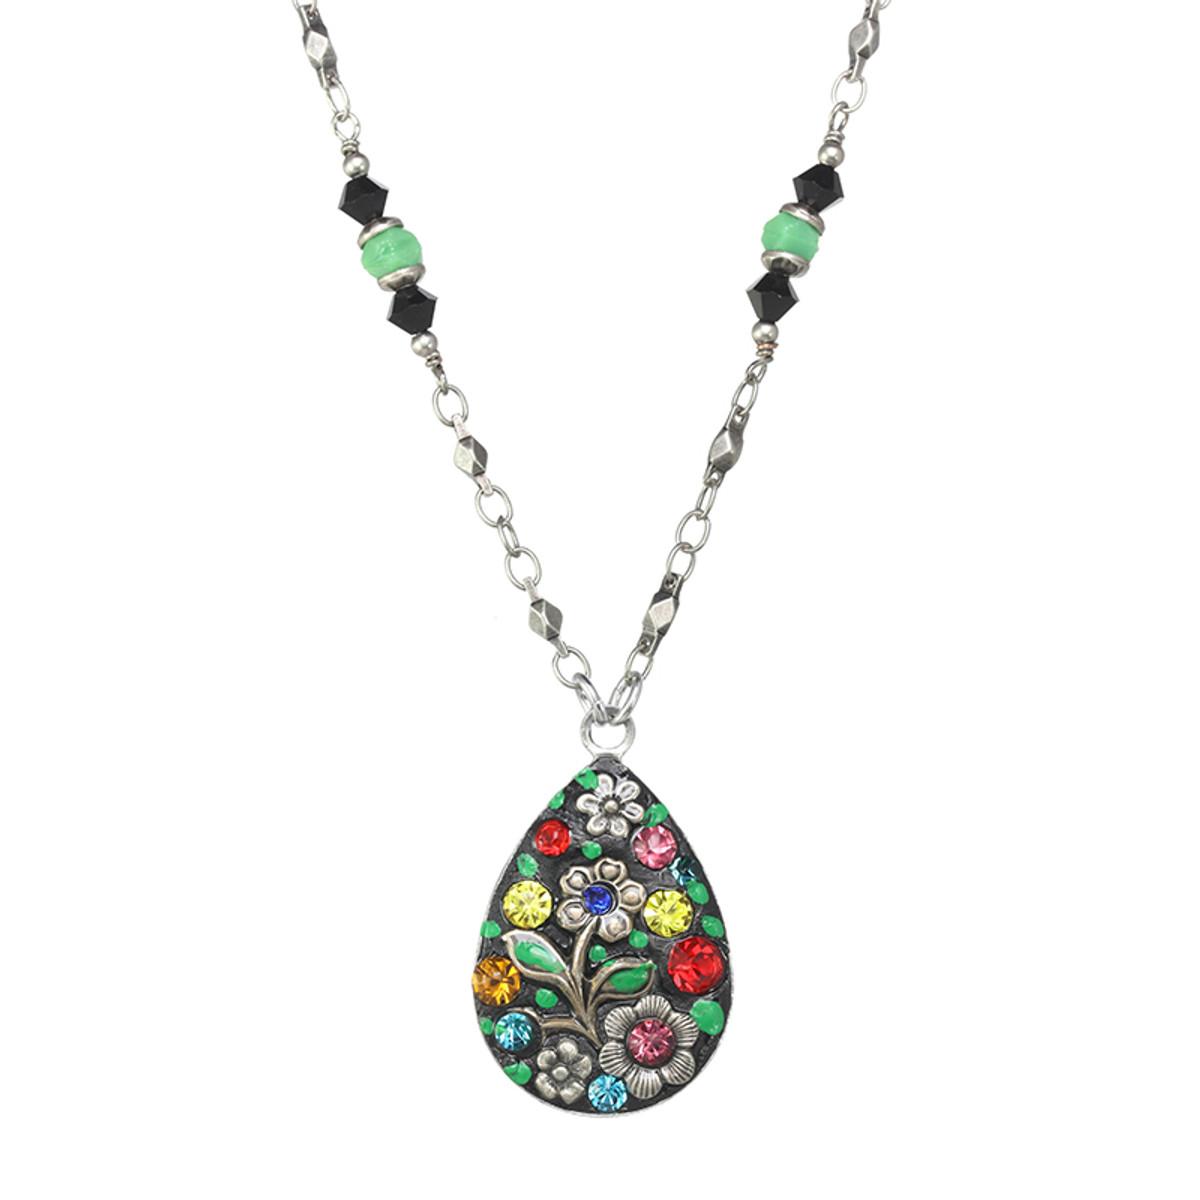 Michal Golan Midsummer Drop Necklace